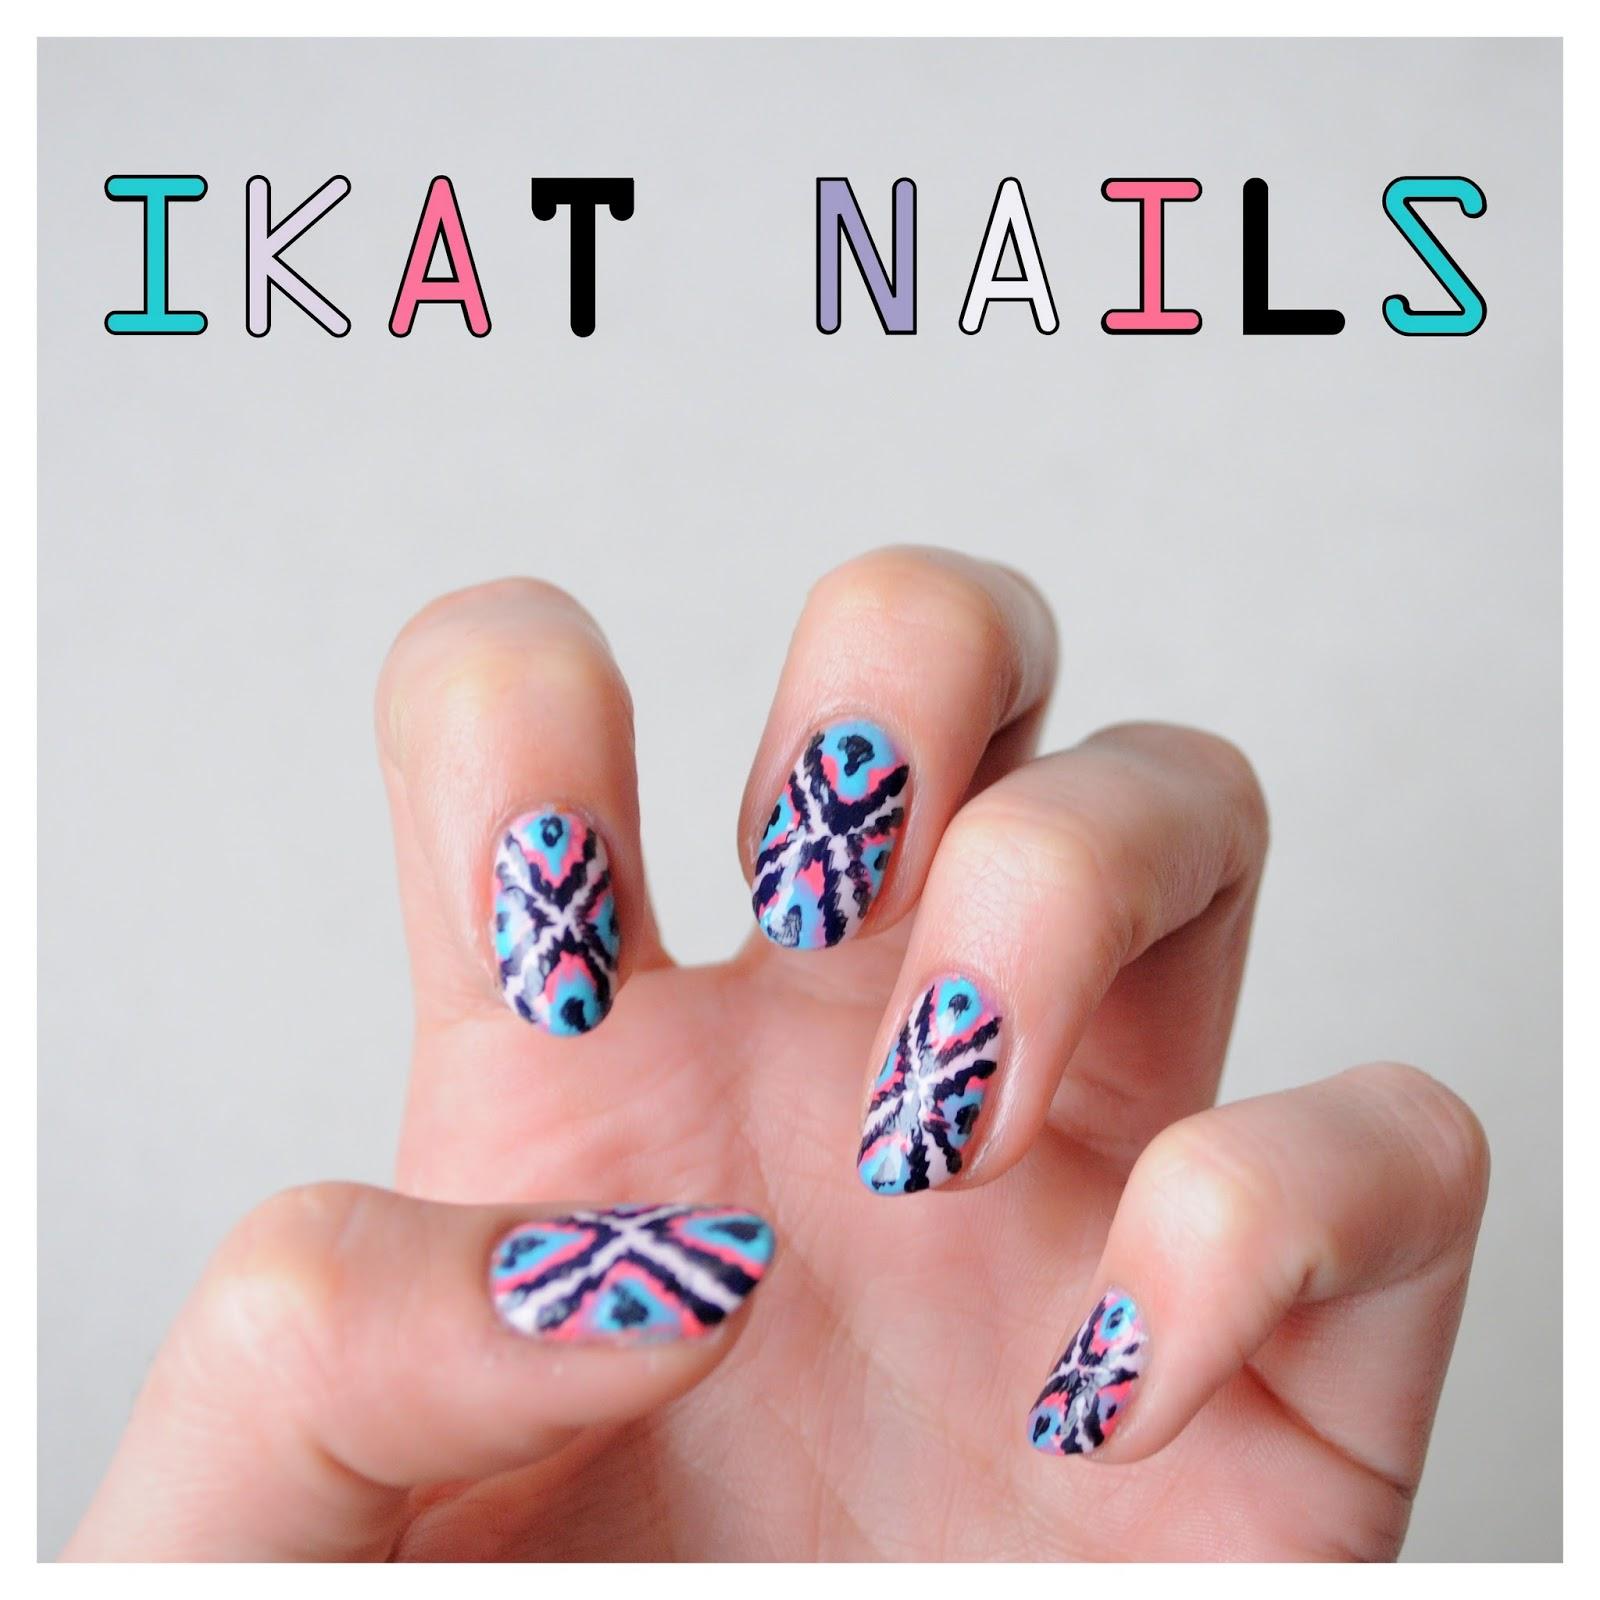 ikat nails=